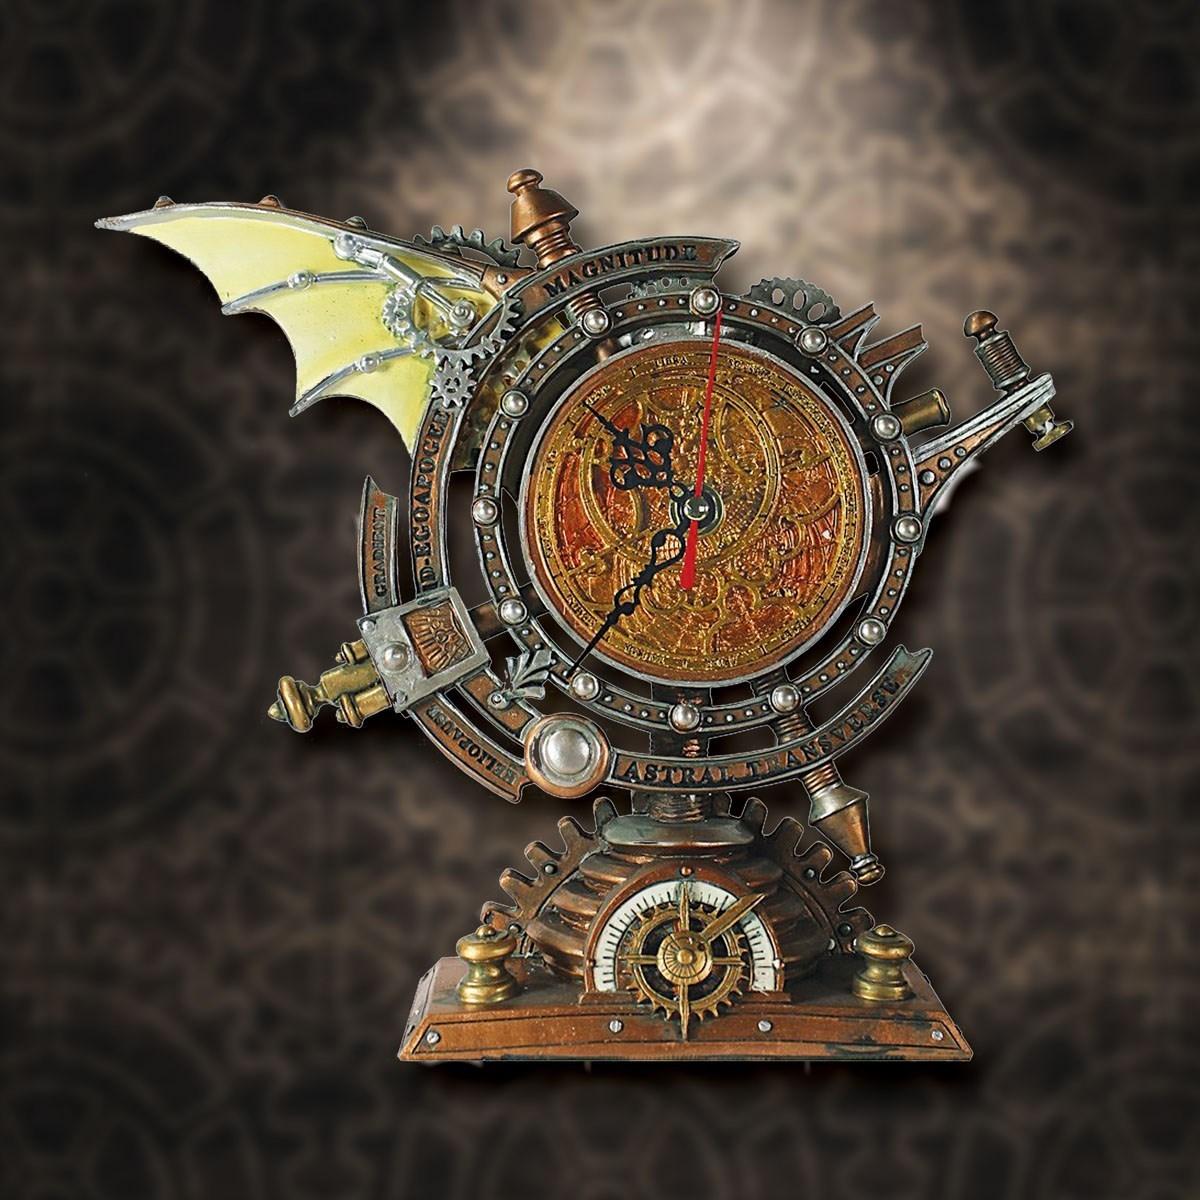 The Chronometer Steampunk Clock